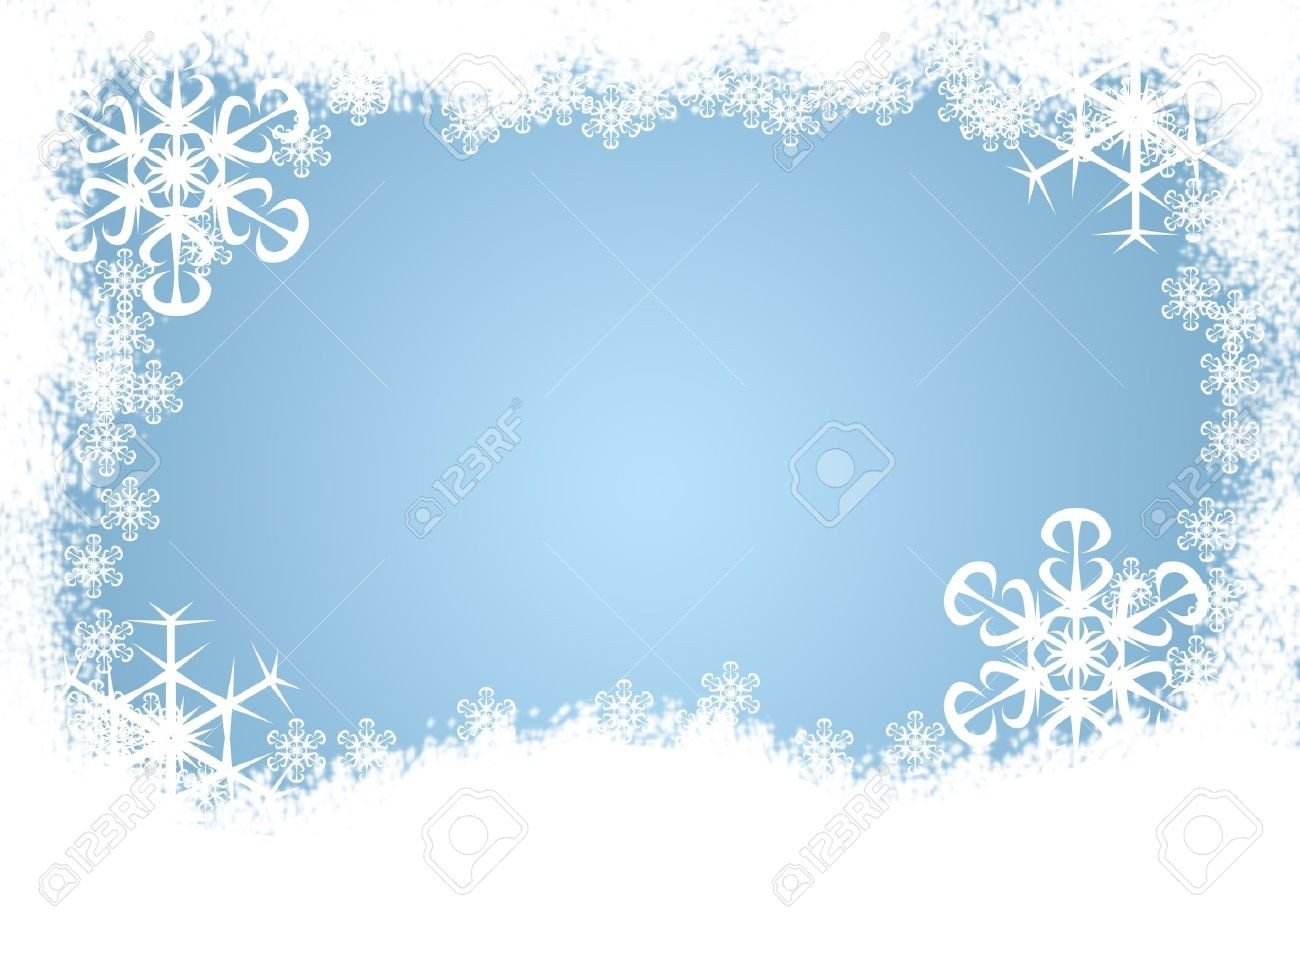 clipart transparent Winter in clip art. Snow borders clipart